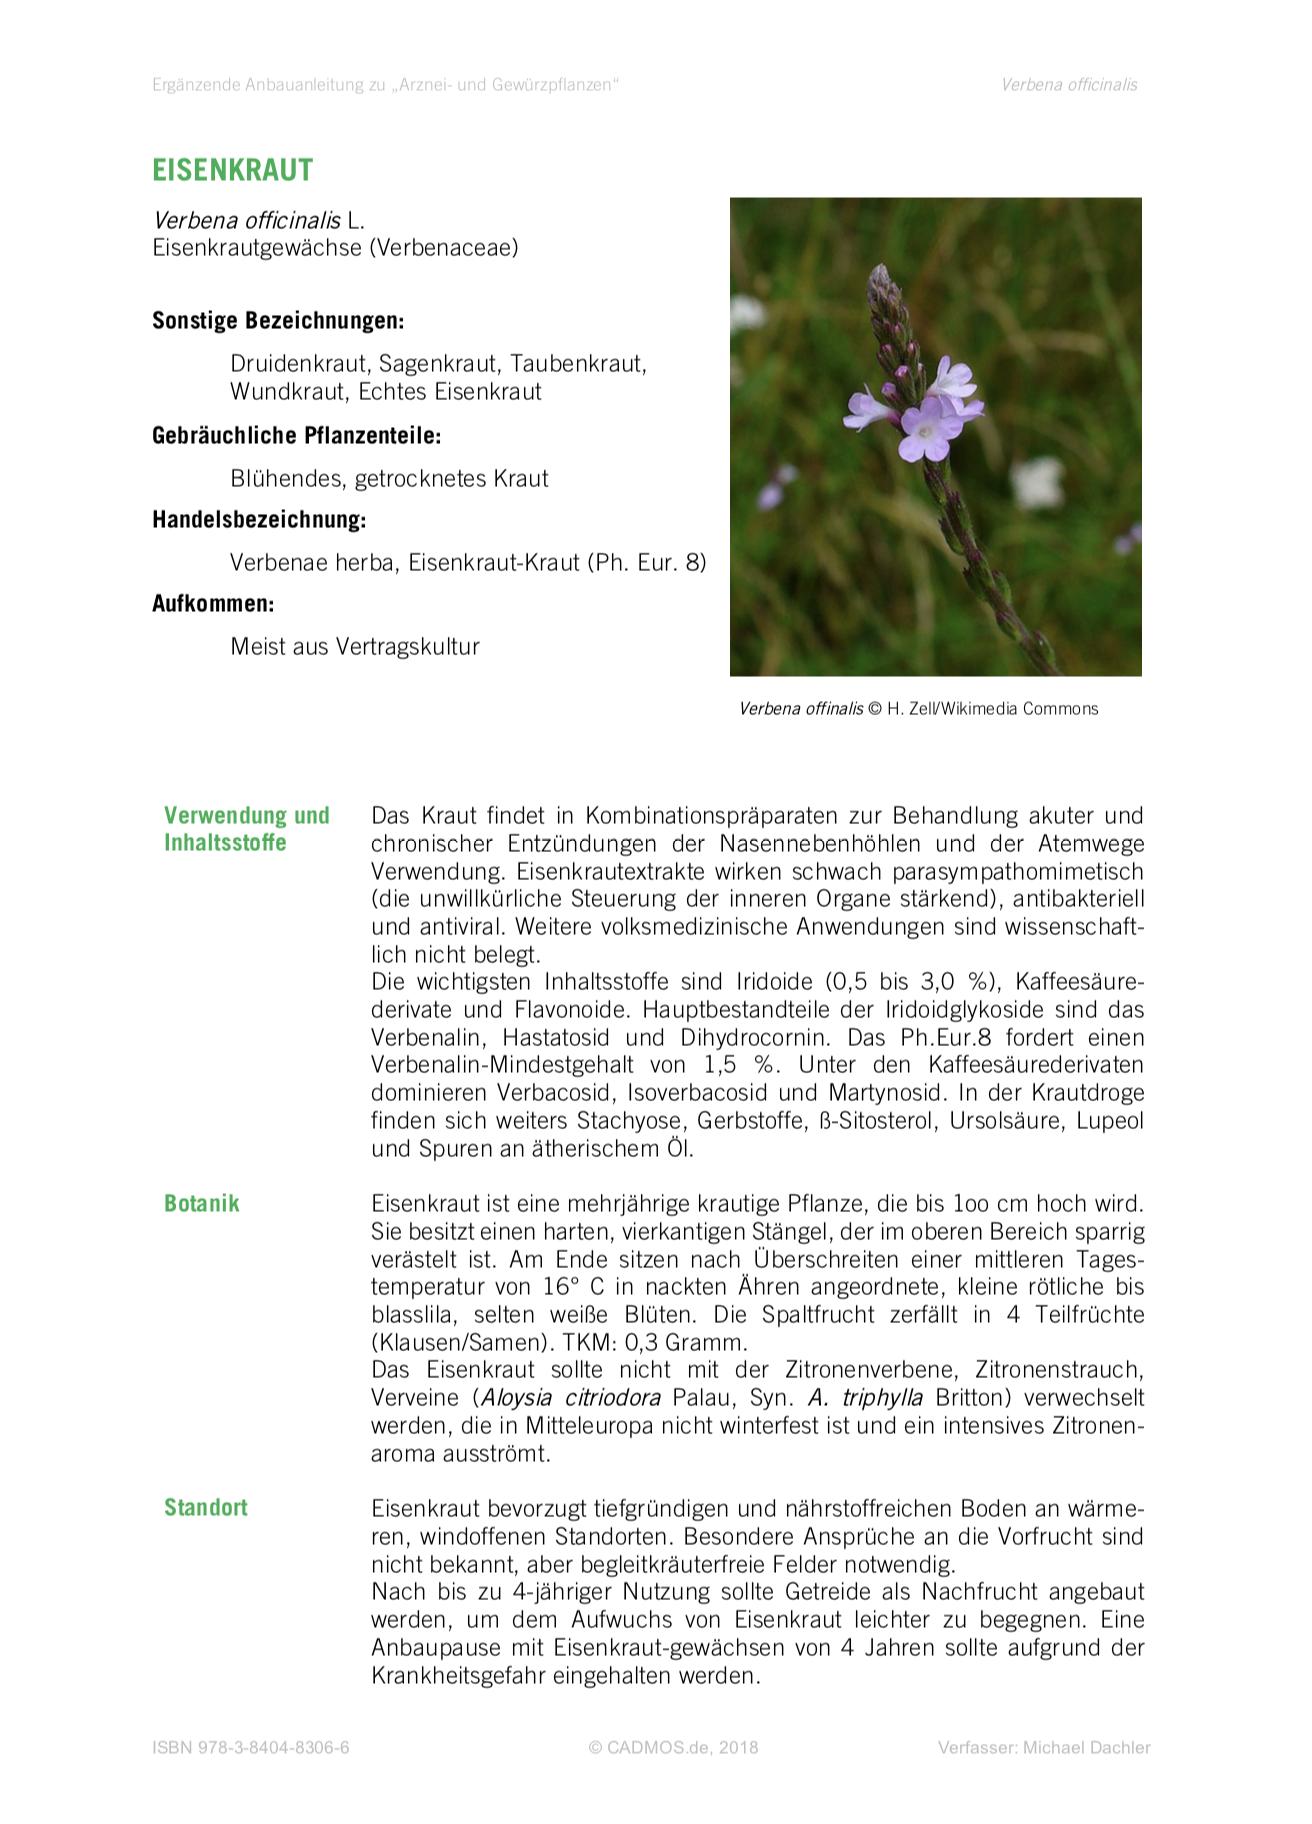 Anbauanleitung Eisenkraut •Verbena officinalis